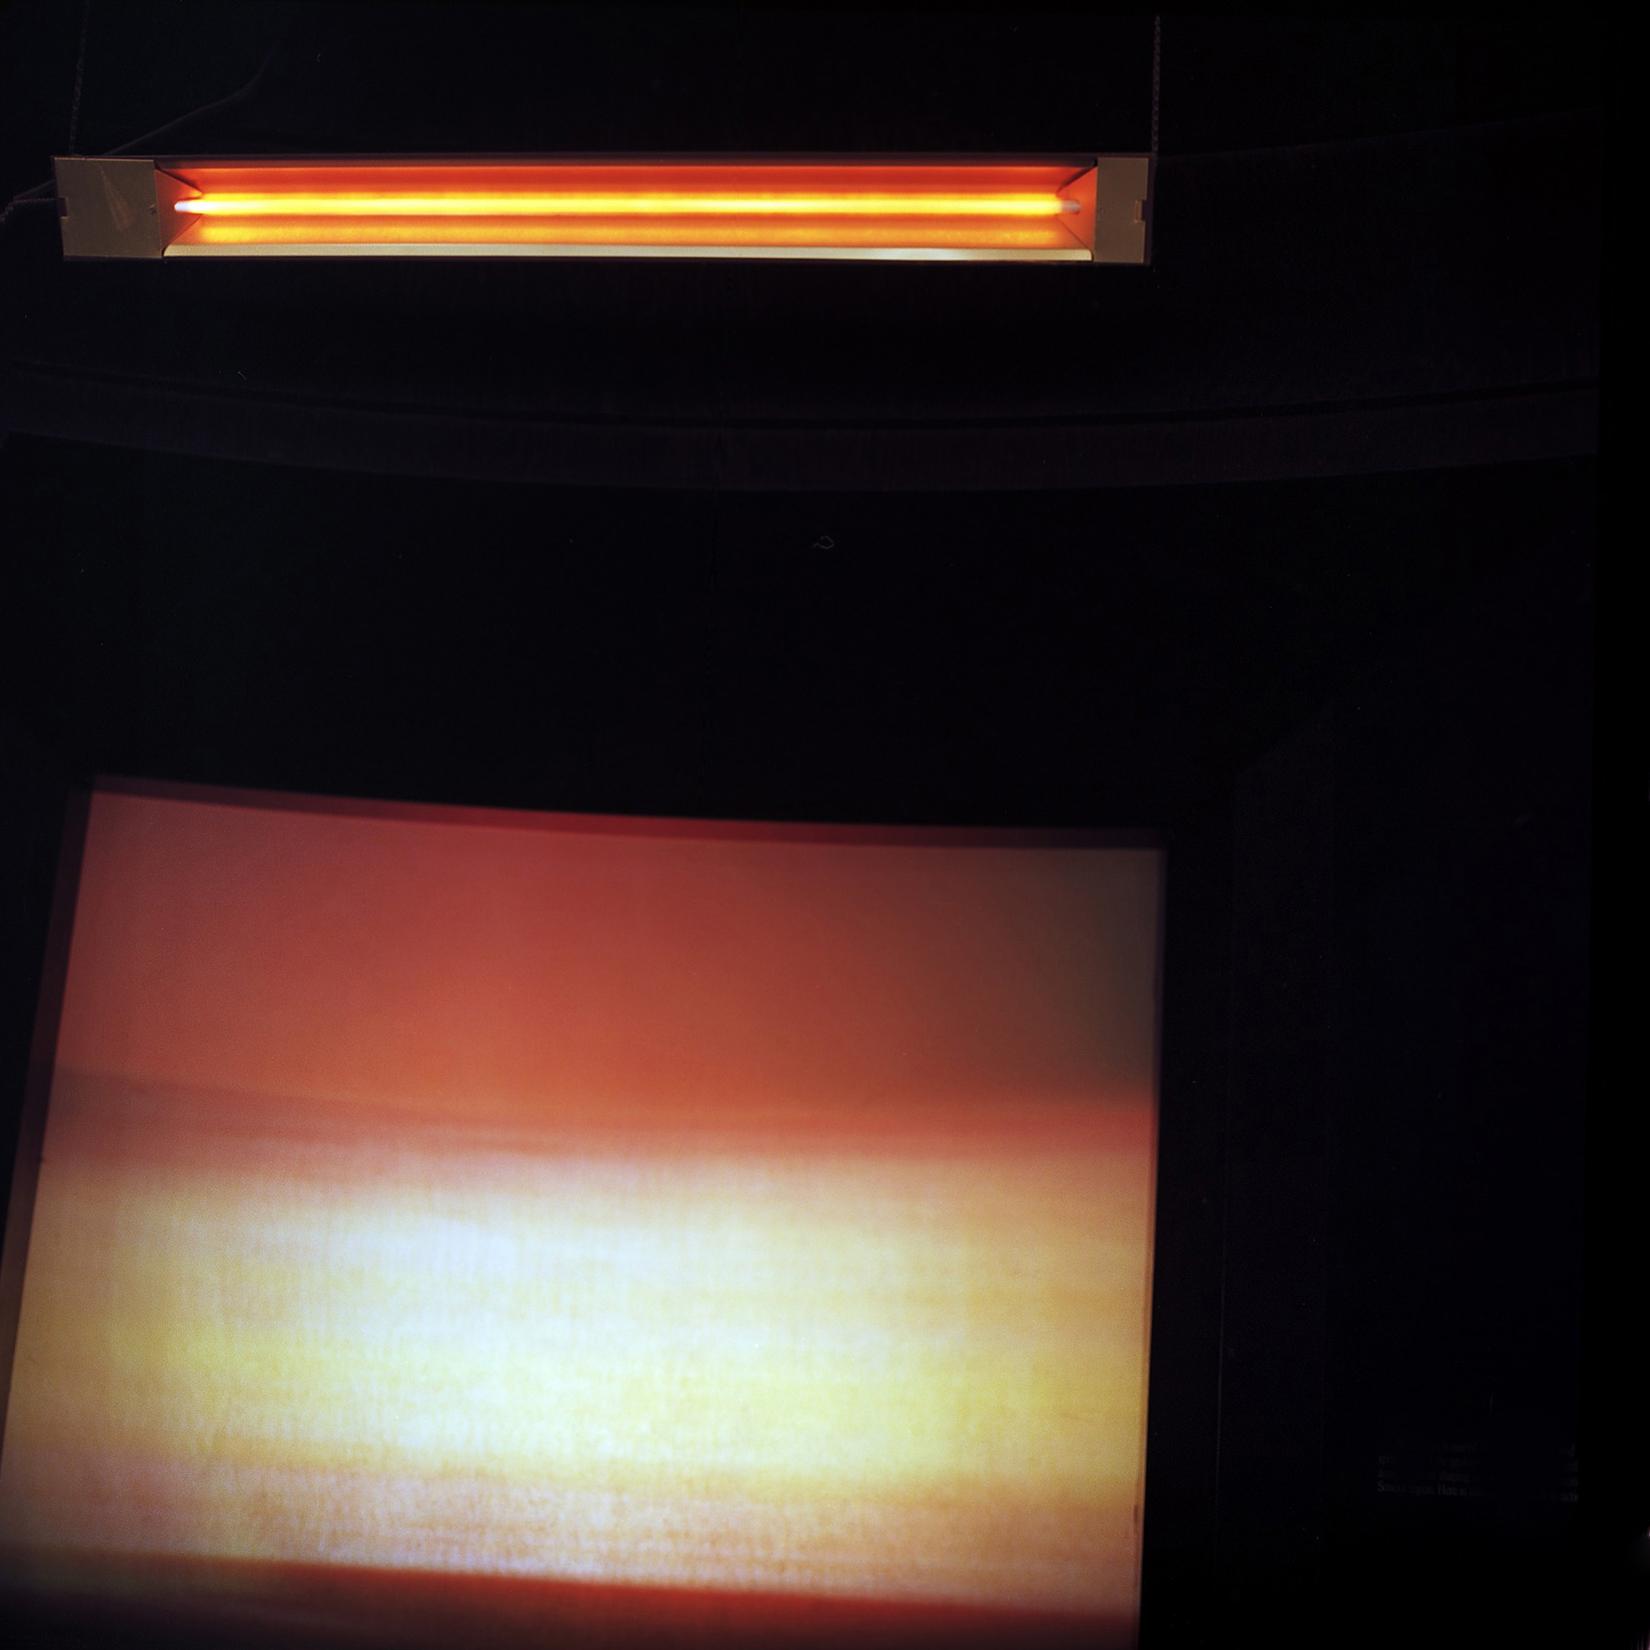 Volcano Footage, Heat Lamp